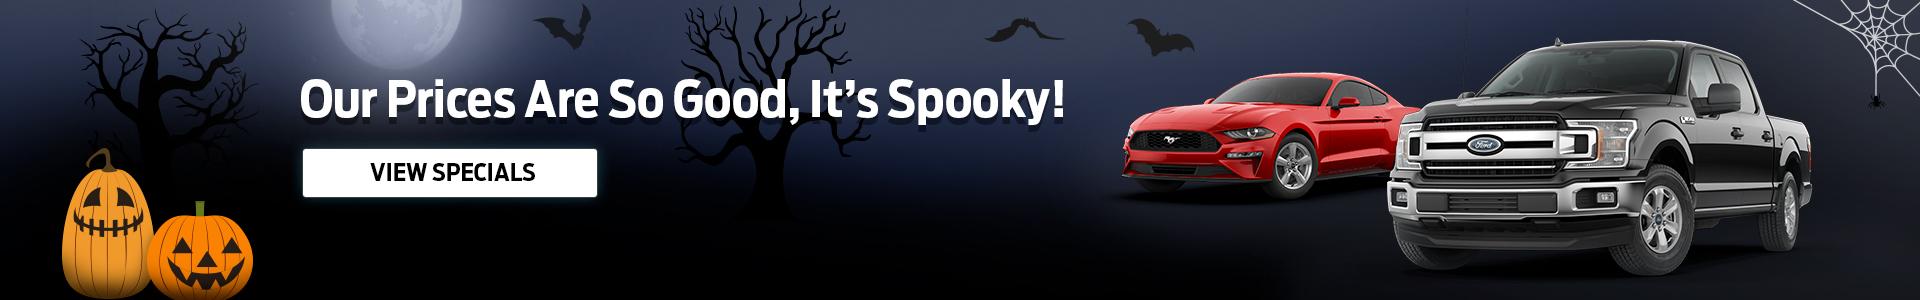 Spooky Savings